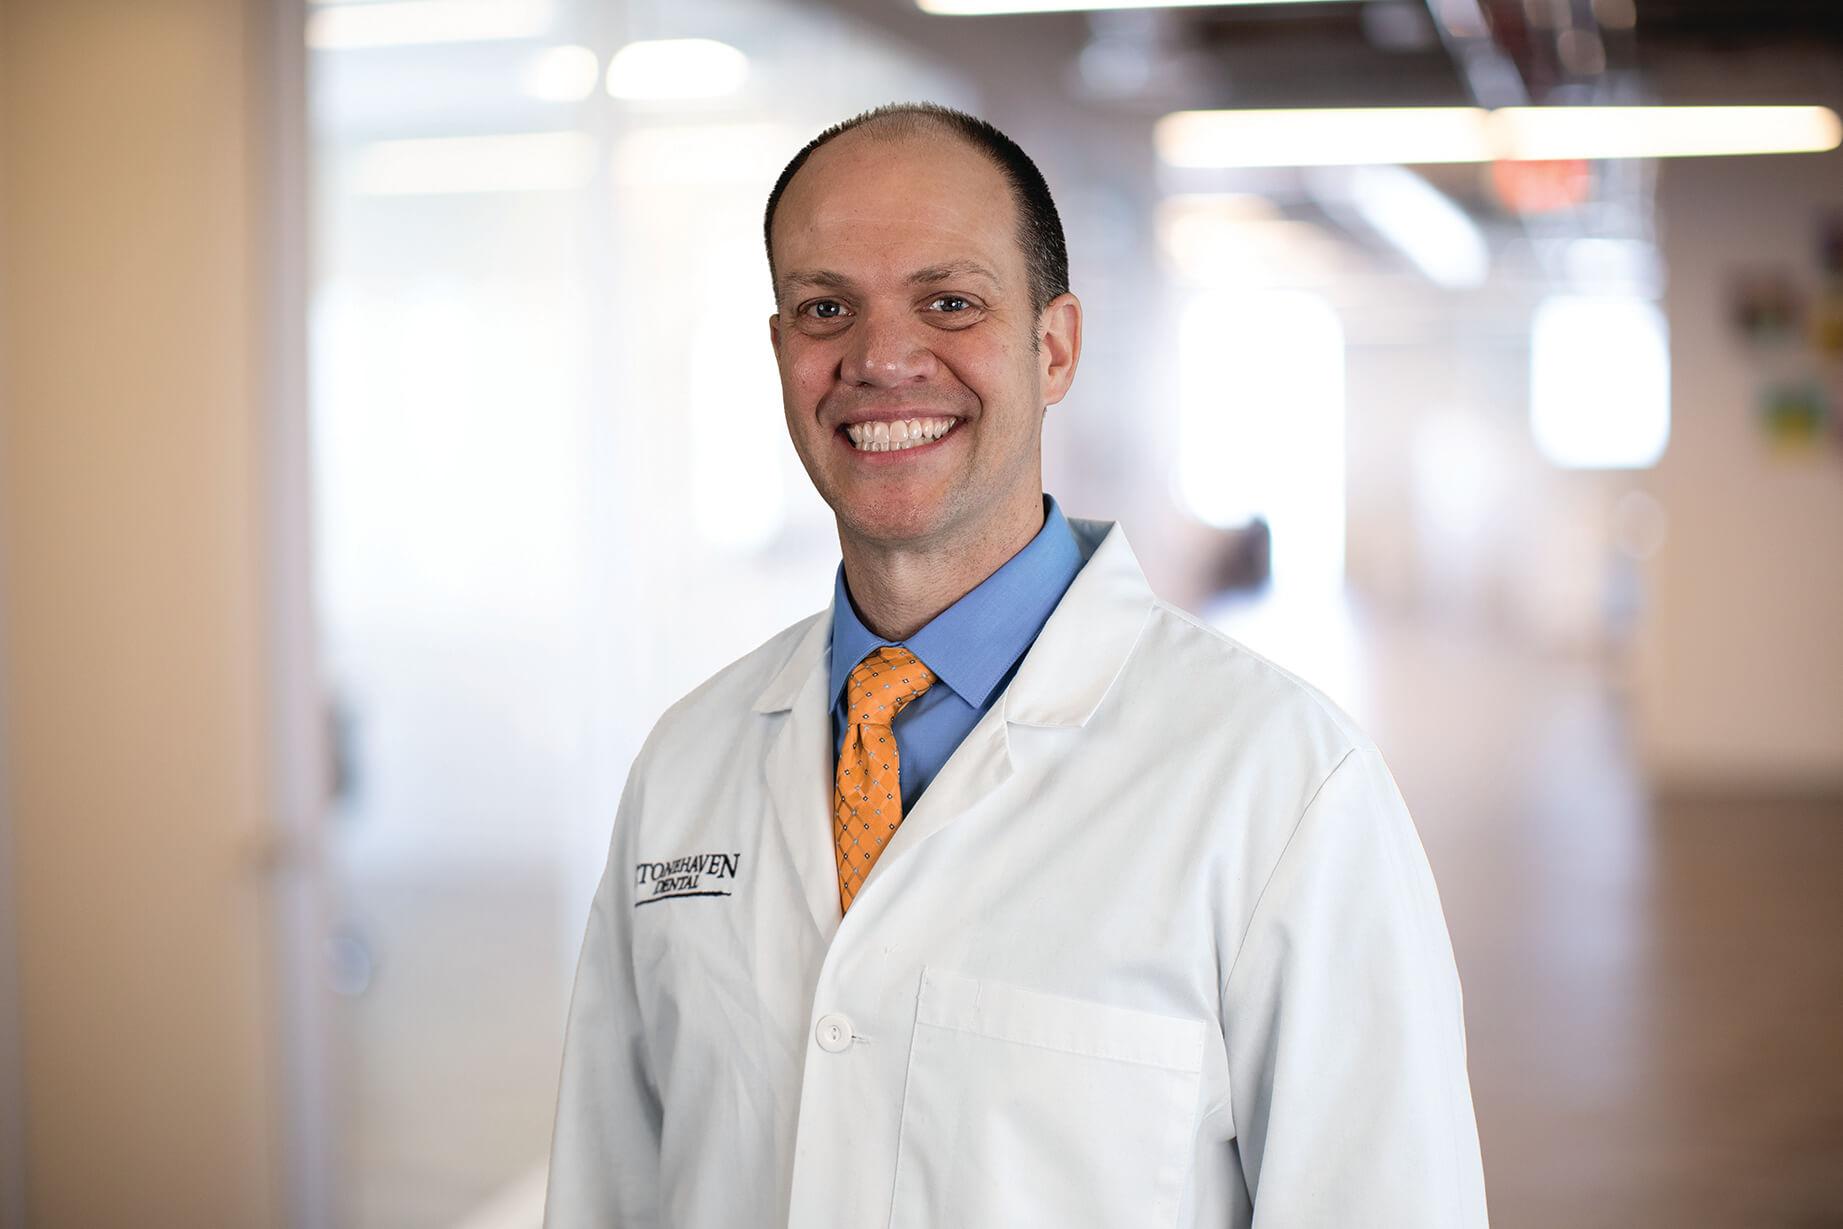 Dr. Cameron K. Heninger